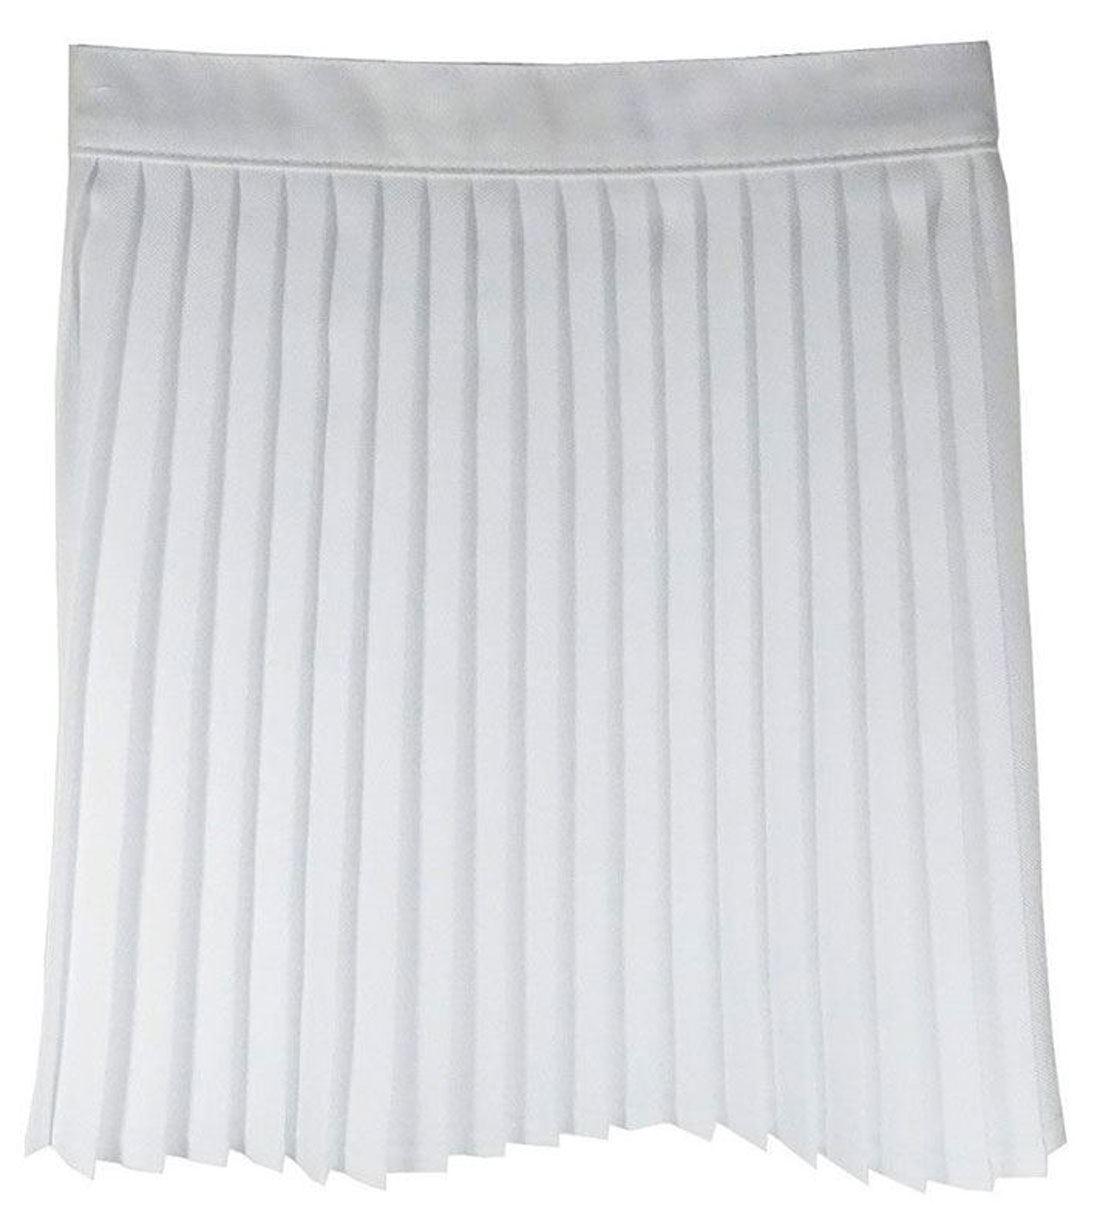 Details about Women Back Pleated Sport Skirt Ladies School Uniform Netball  Gym Kilt PE Skirt